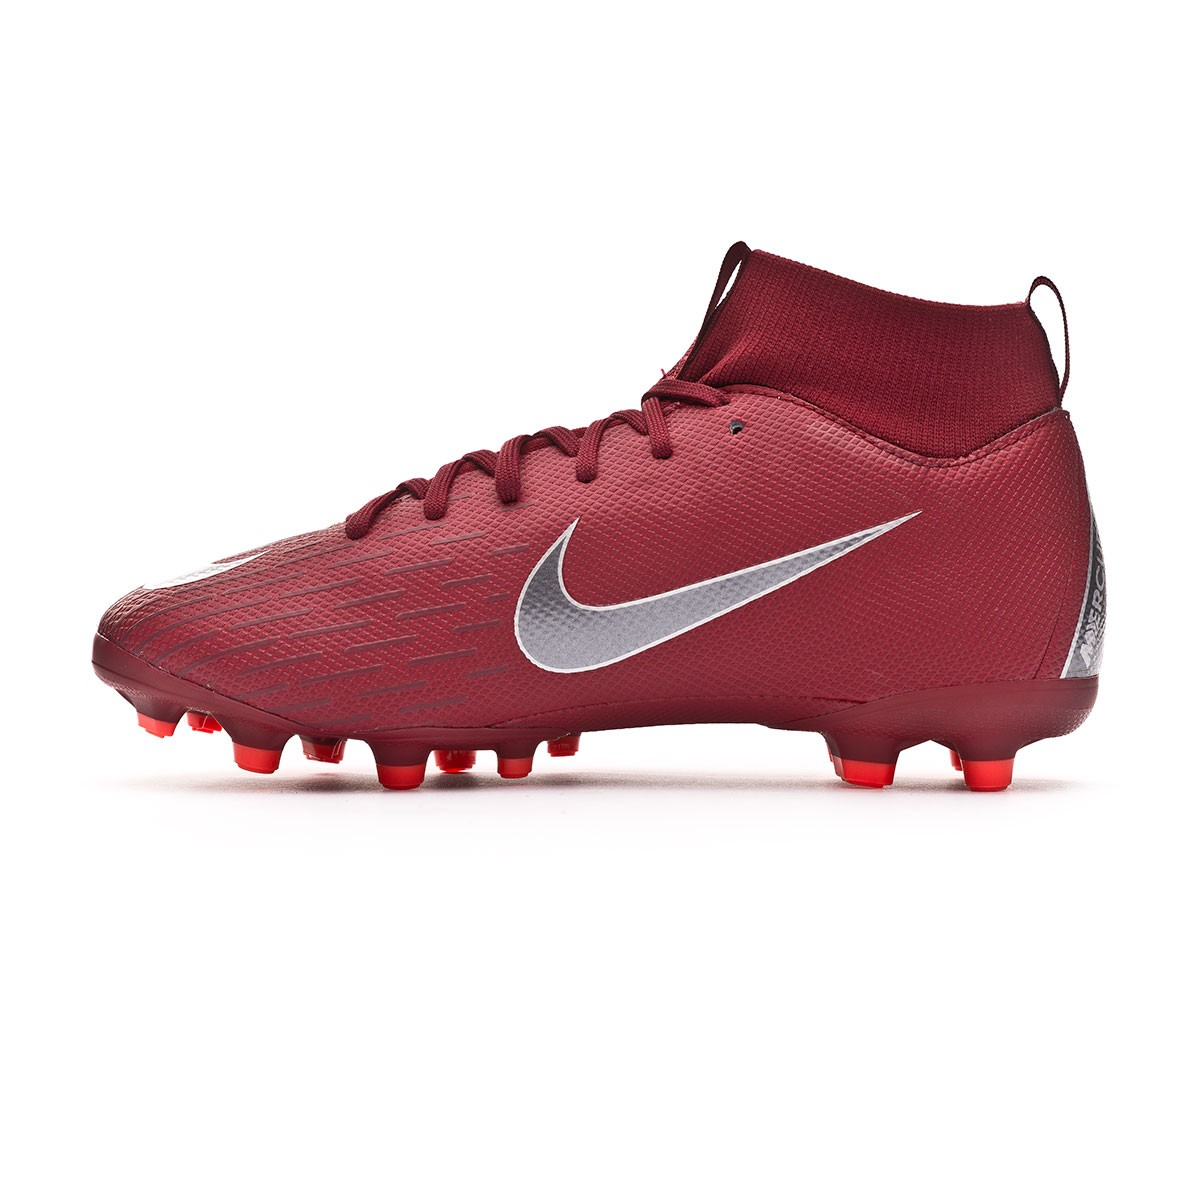 22fc864f1e Chuteira Nike Mercurial Superfly VI Academy GS MG Niño Team red-Metallic  dark grey-Bright crimson - Loja de futebol Fútbol Emotion